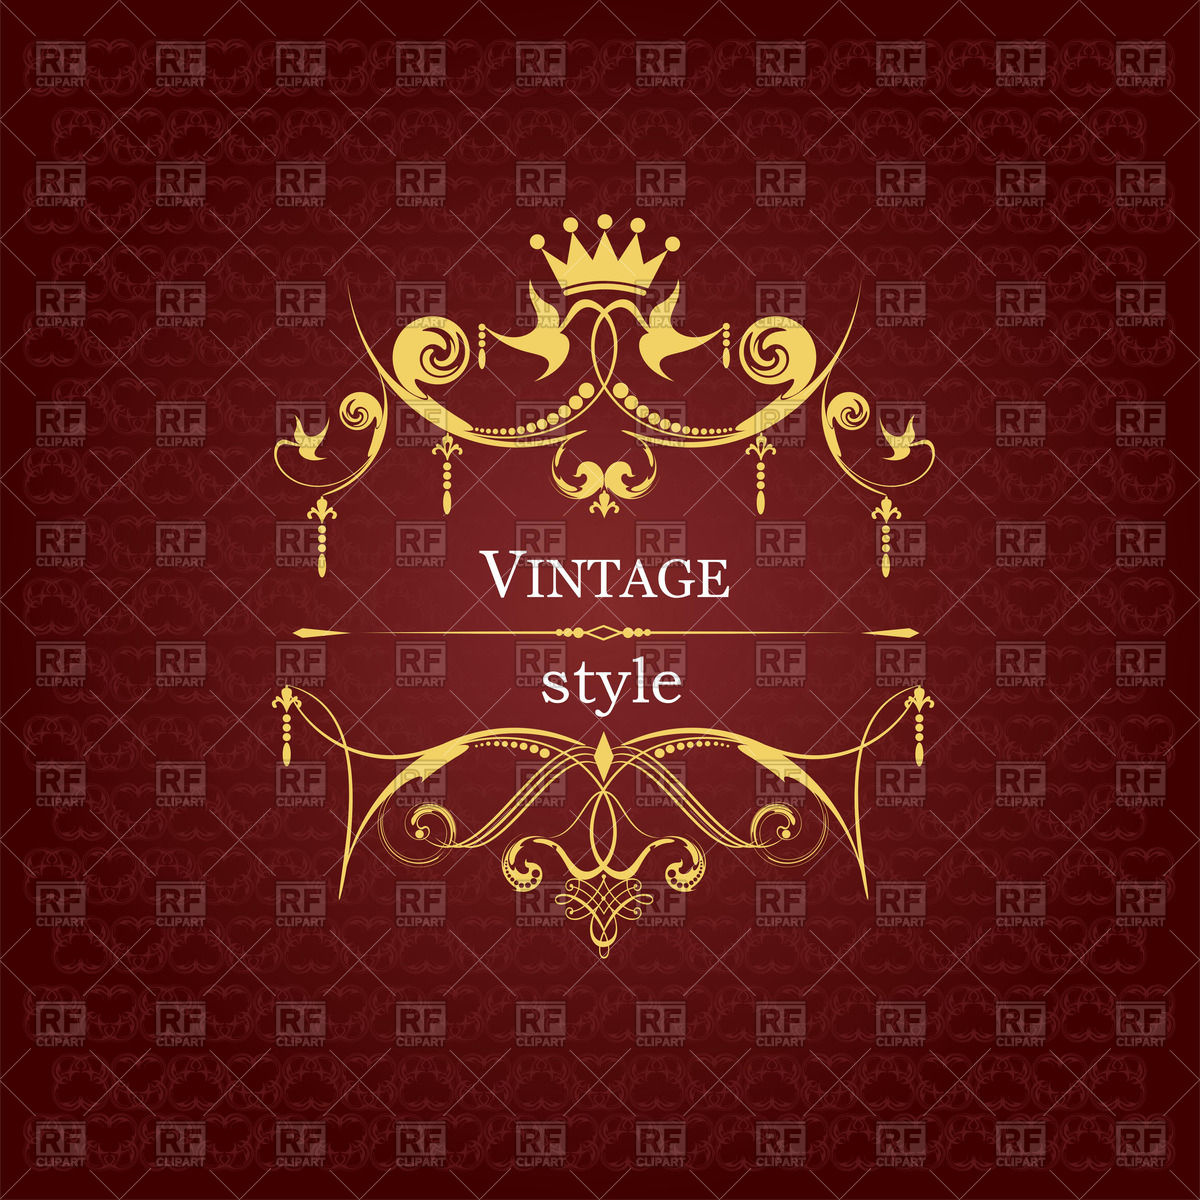 1200x1200 Vintage Style Ornate Golden Royal Frame On Burgundy Background